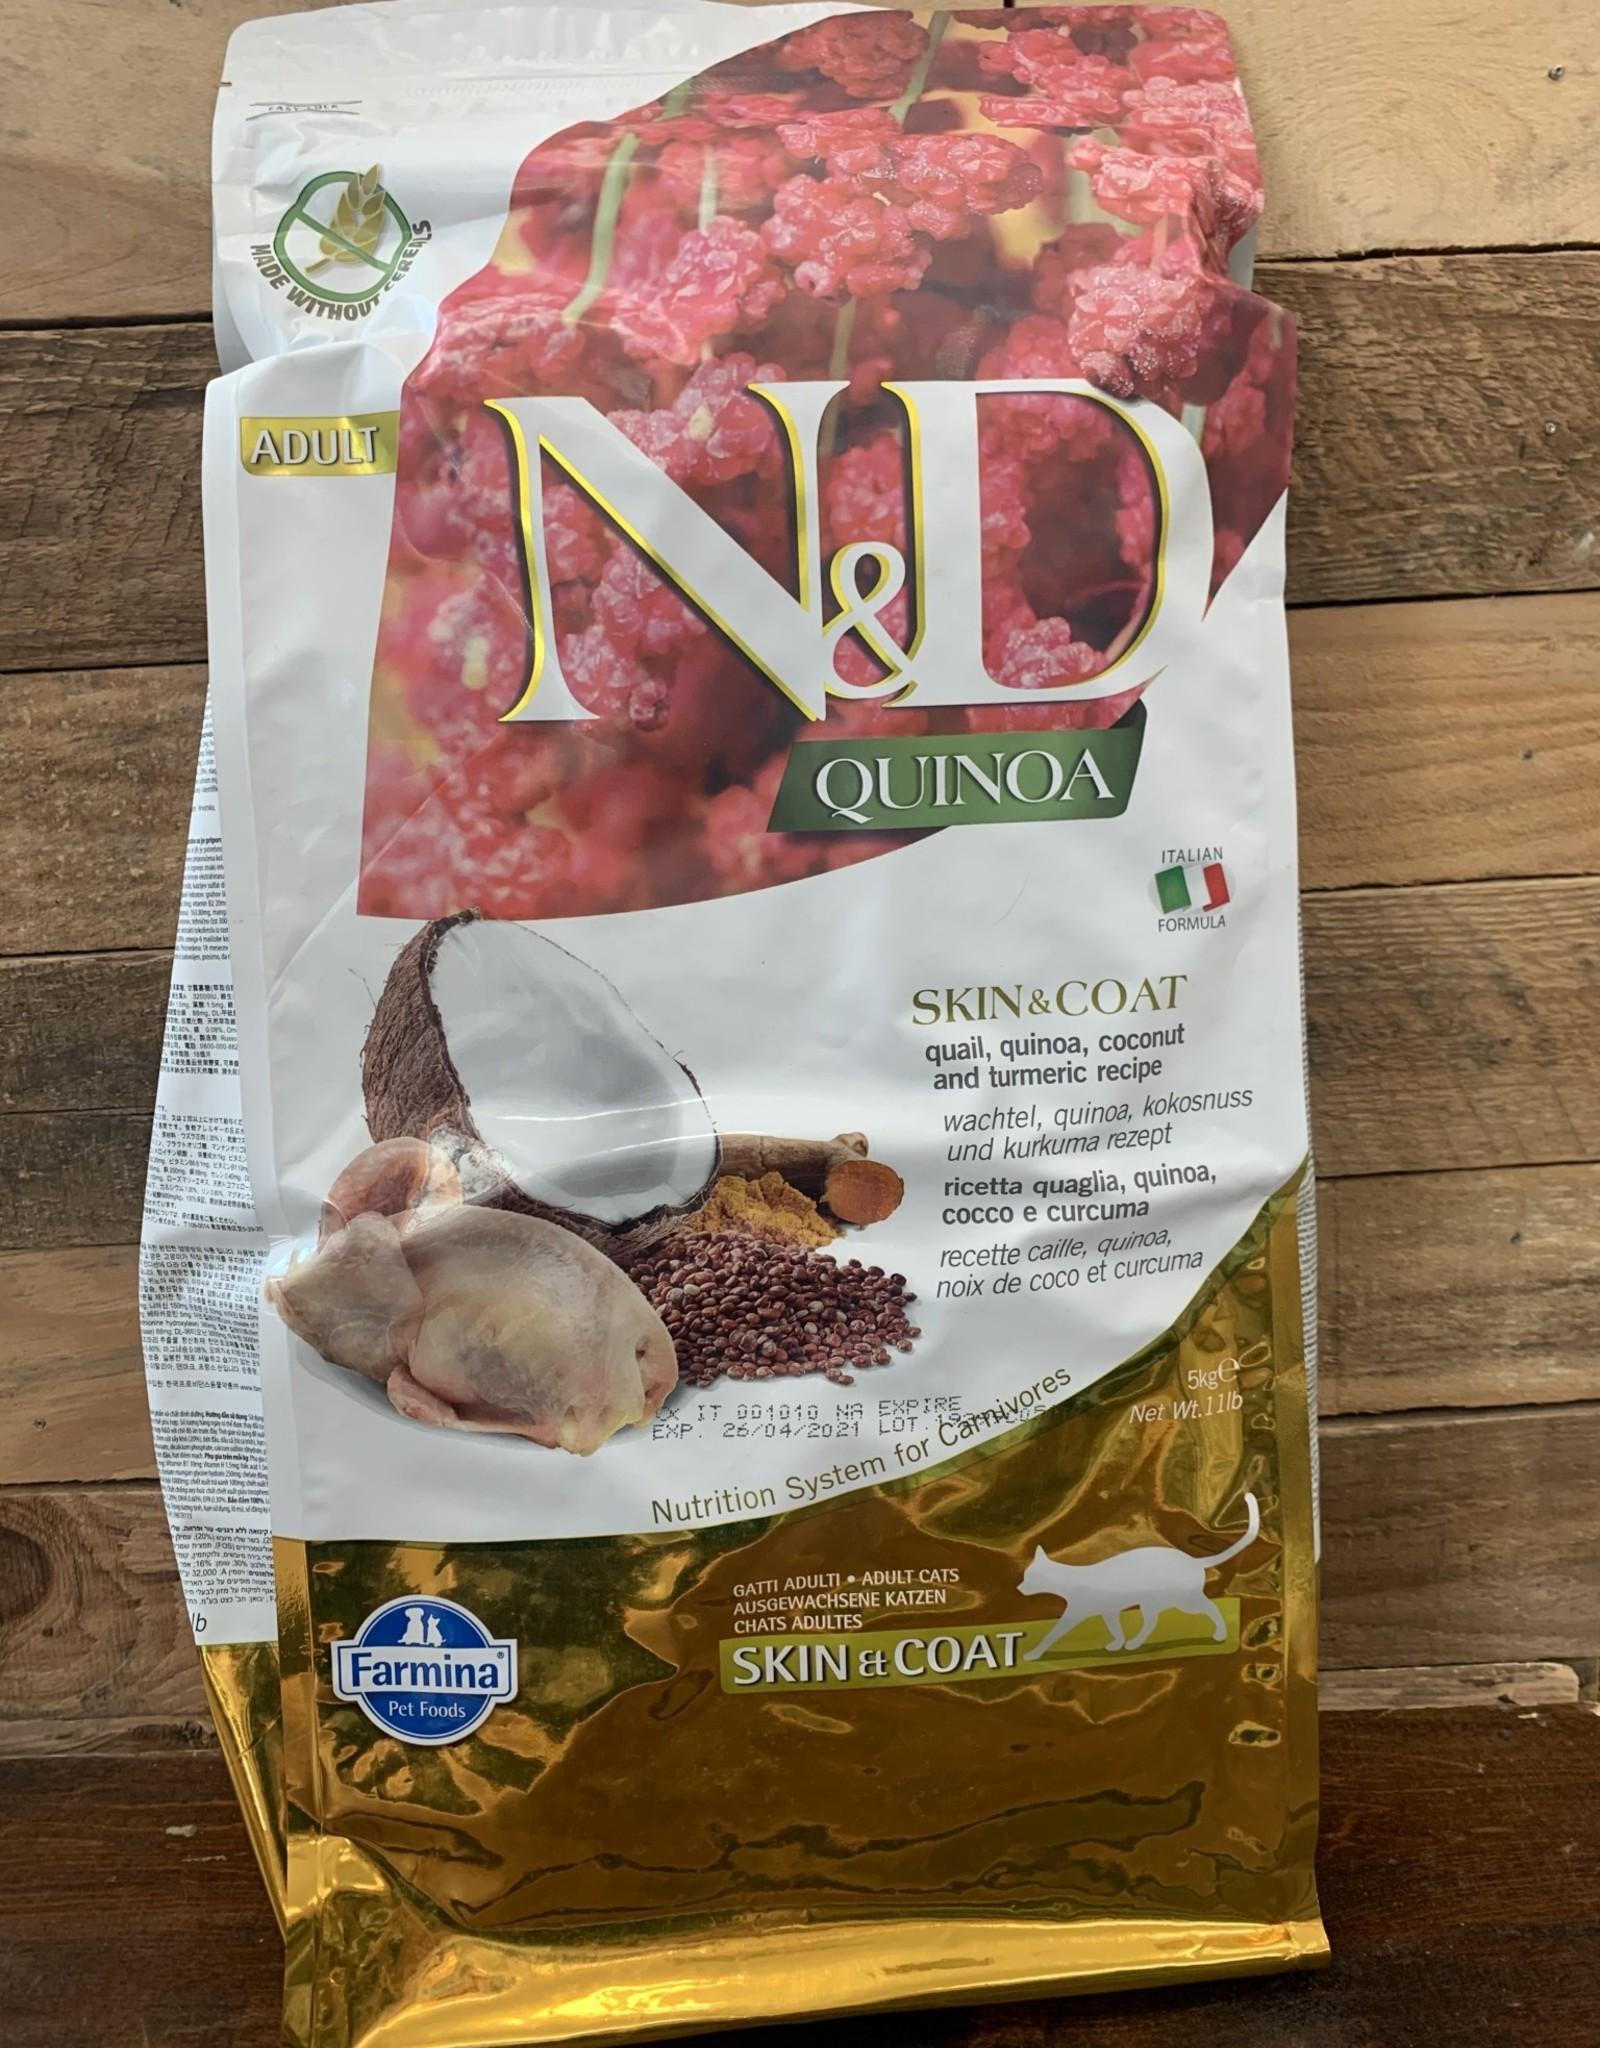 Farmina Farmina N&D Quinoa Skin and Coat Quail cat 11#